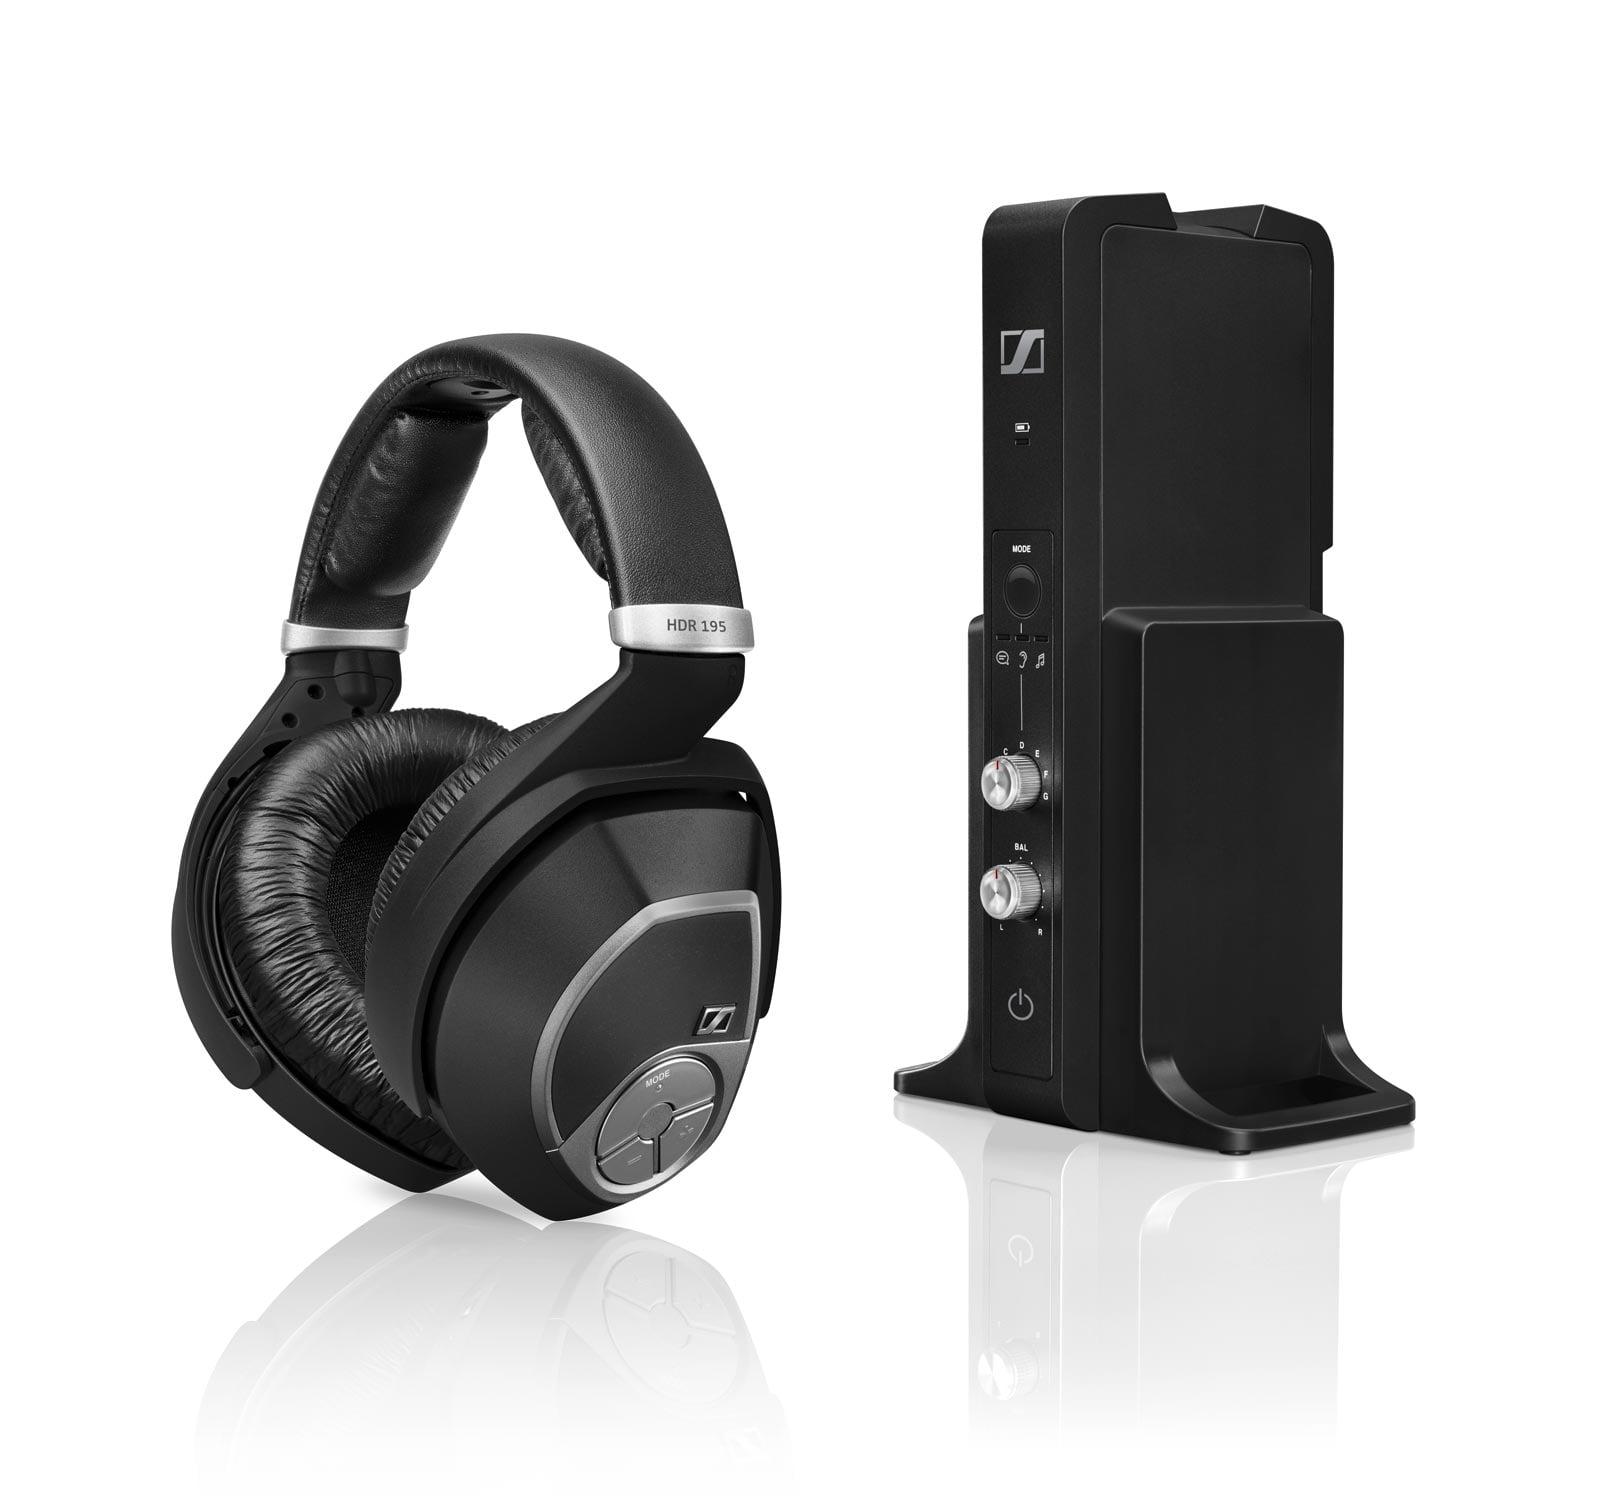 Sennheiser RS 195 - TV and Home Audio Wireless Headphones